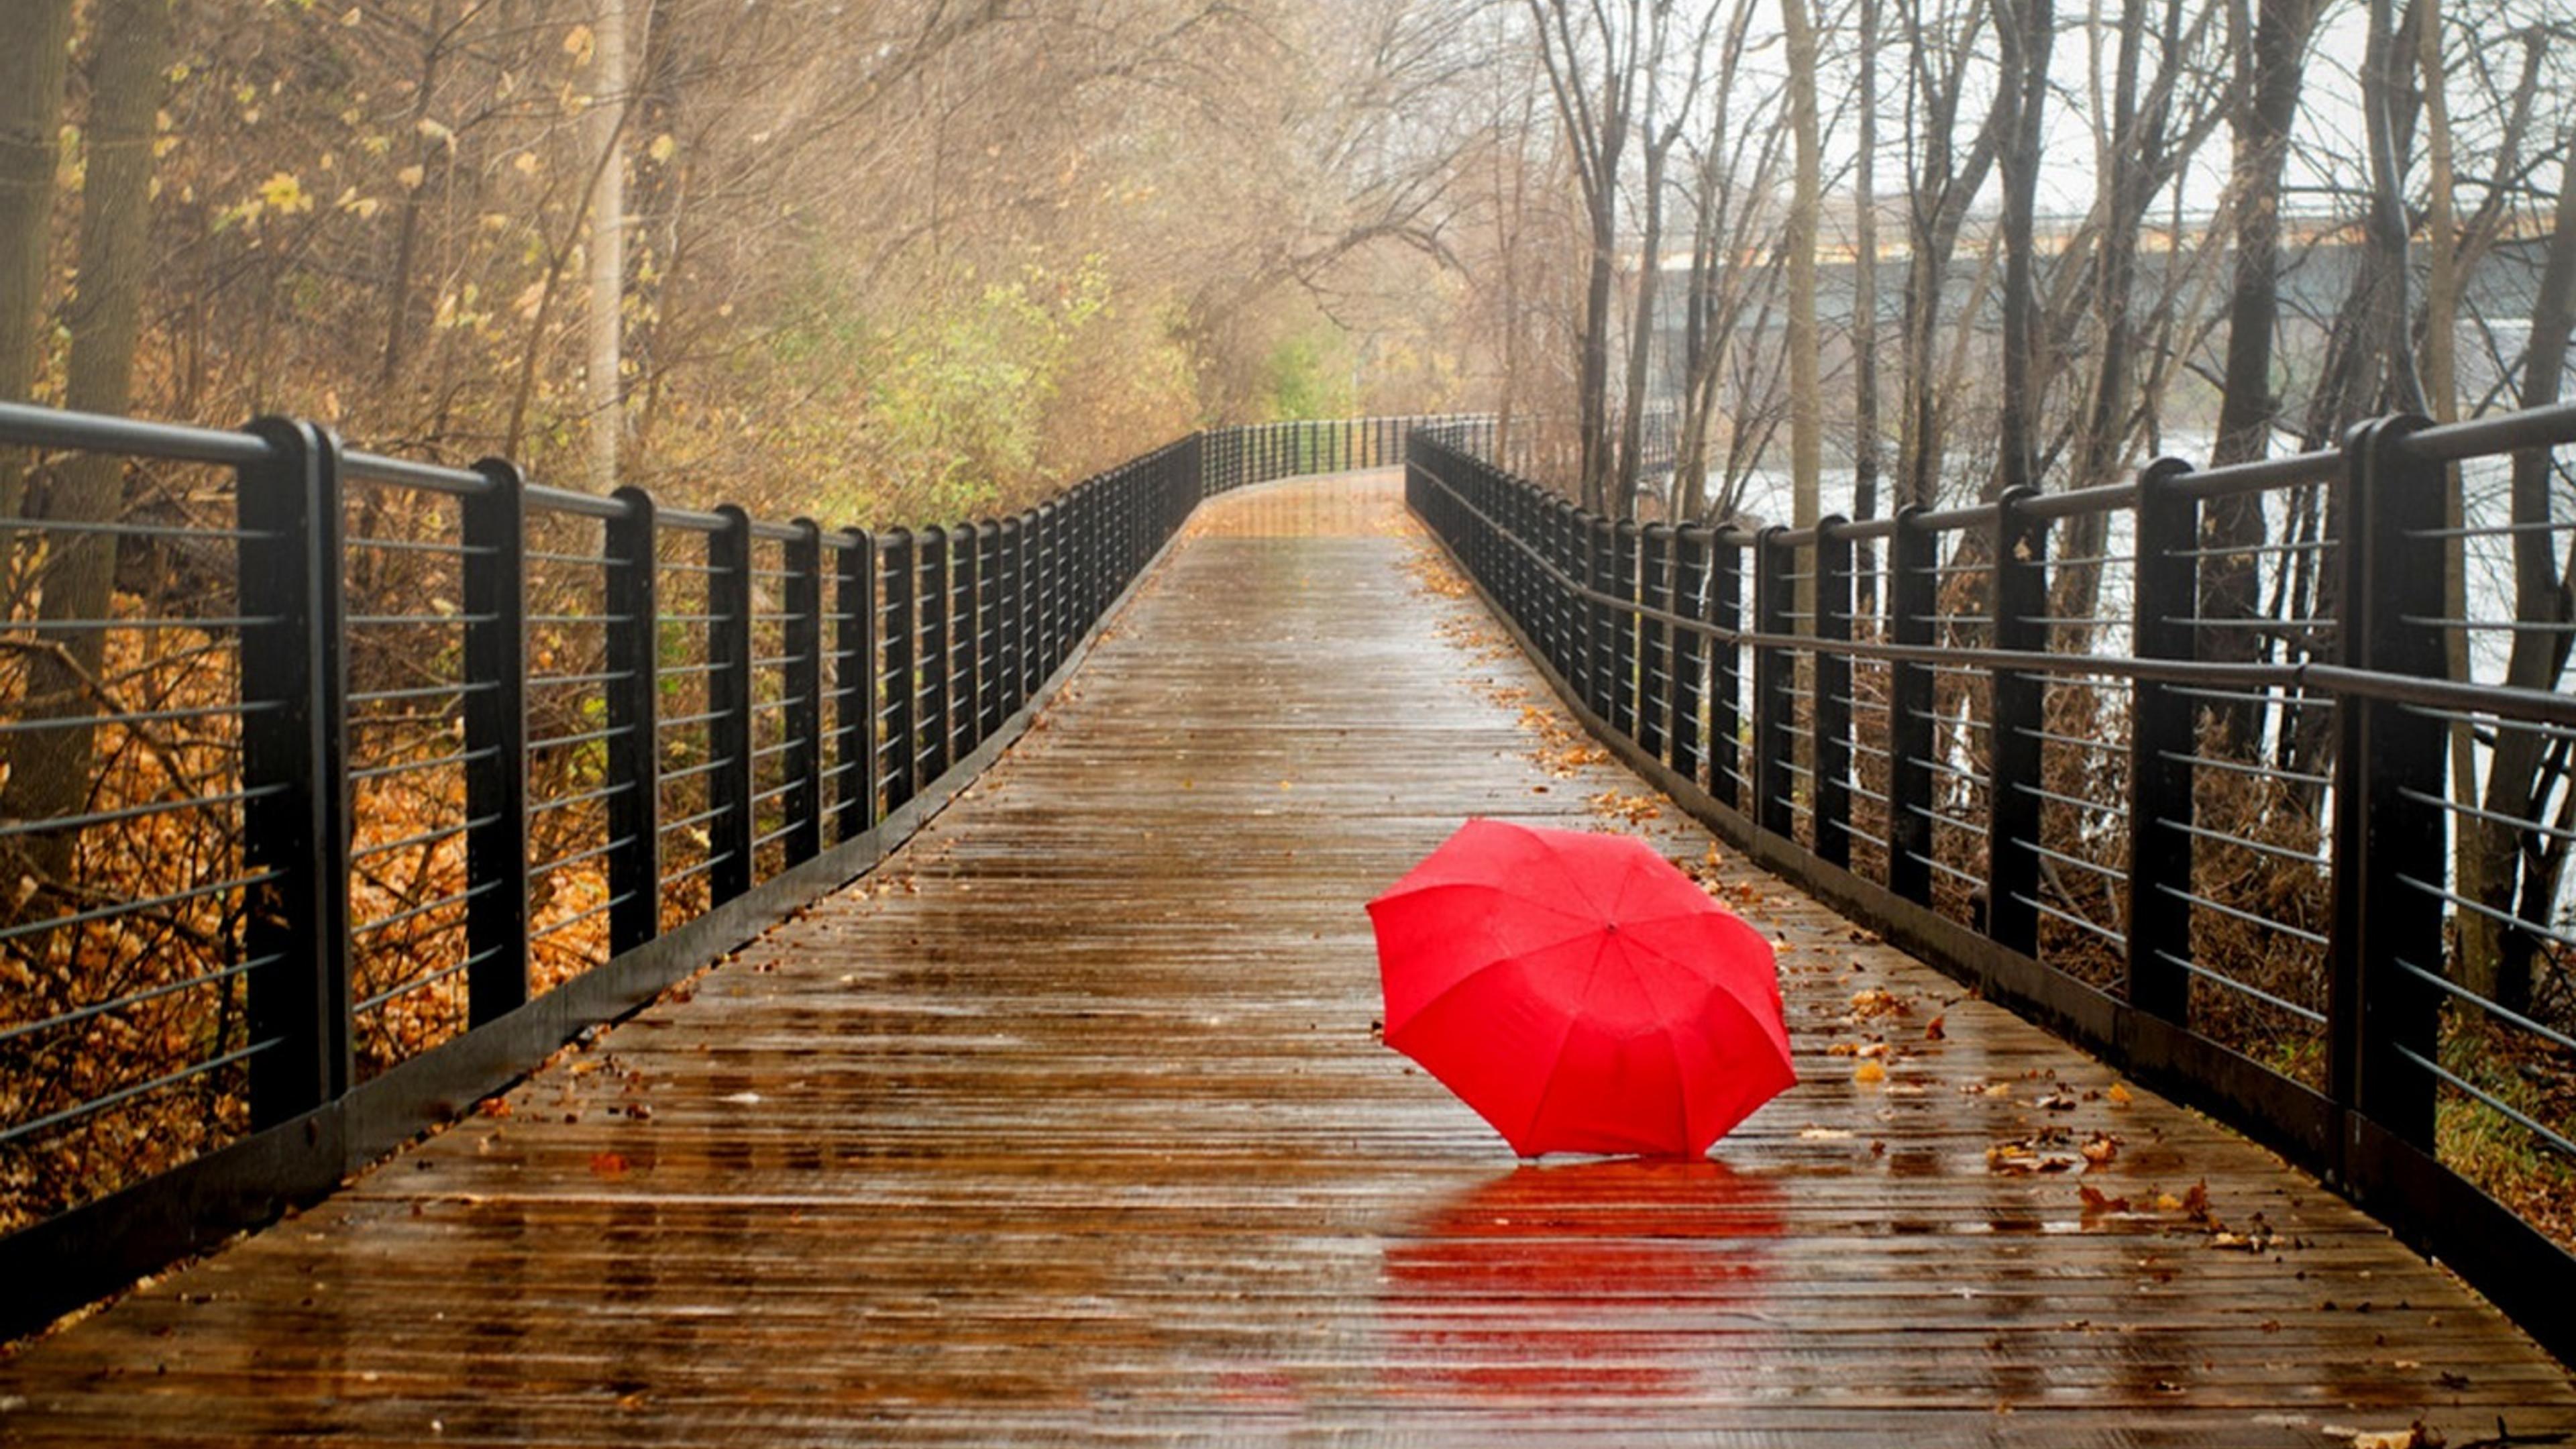 Red umbrella on the bridge - Rainy day Wallpaper Download ...